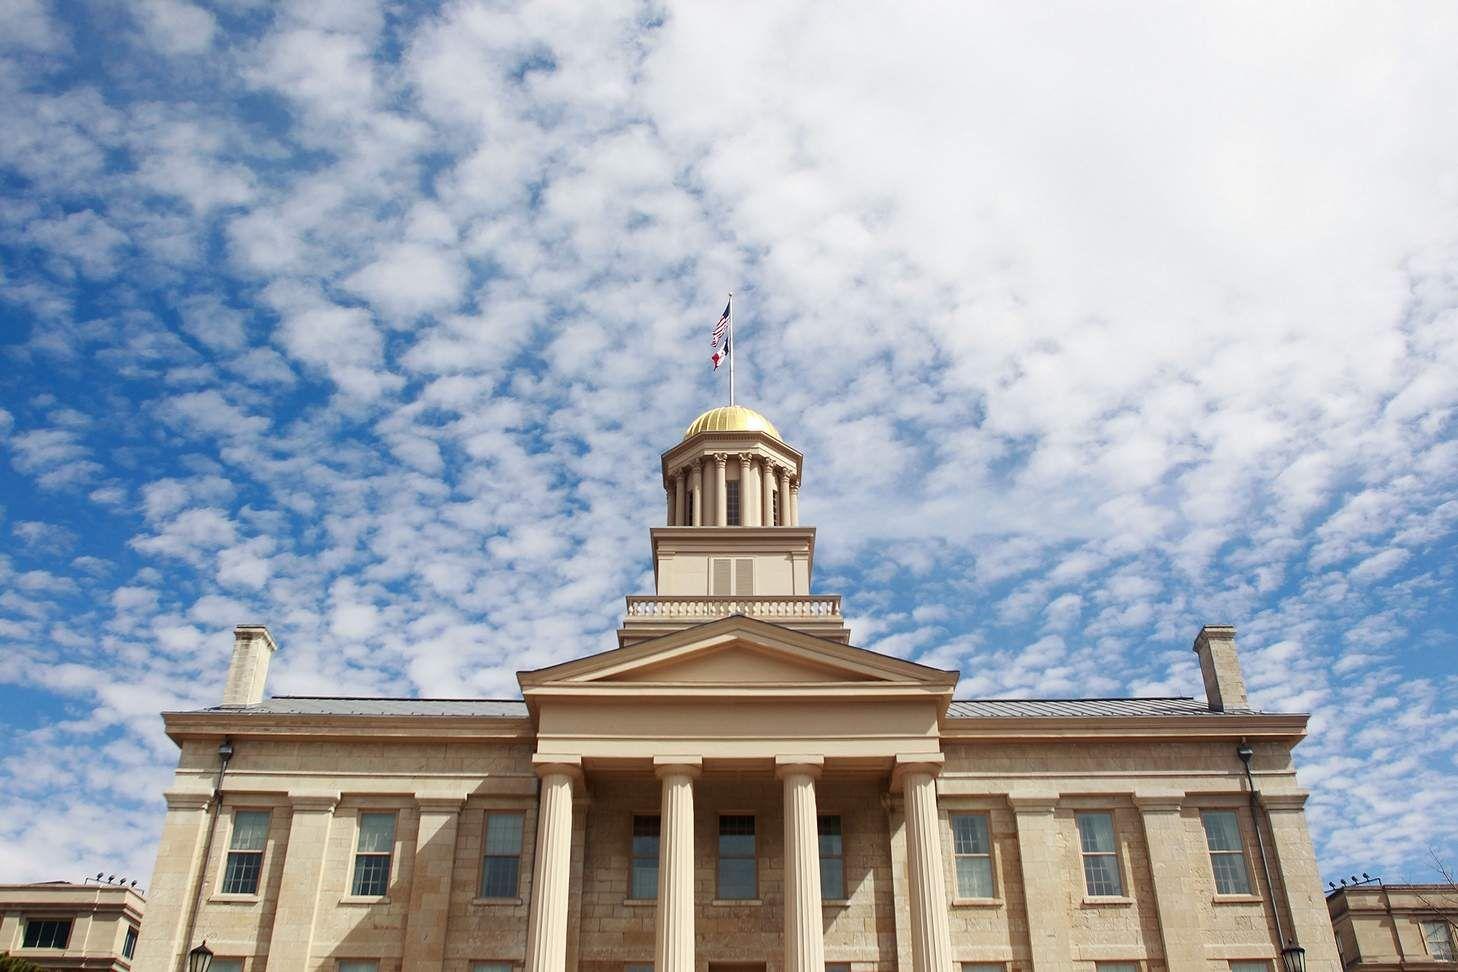 University of Iowa to require engineers get 'creative